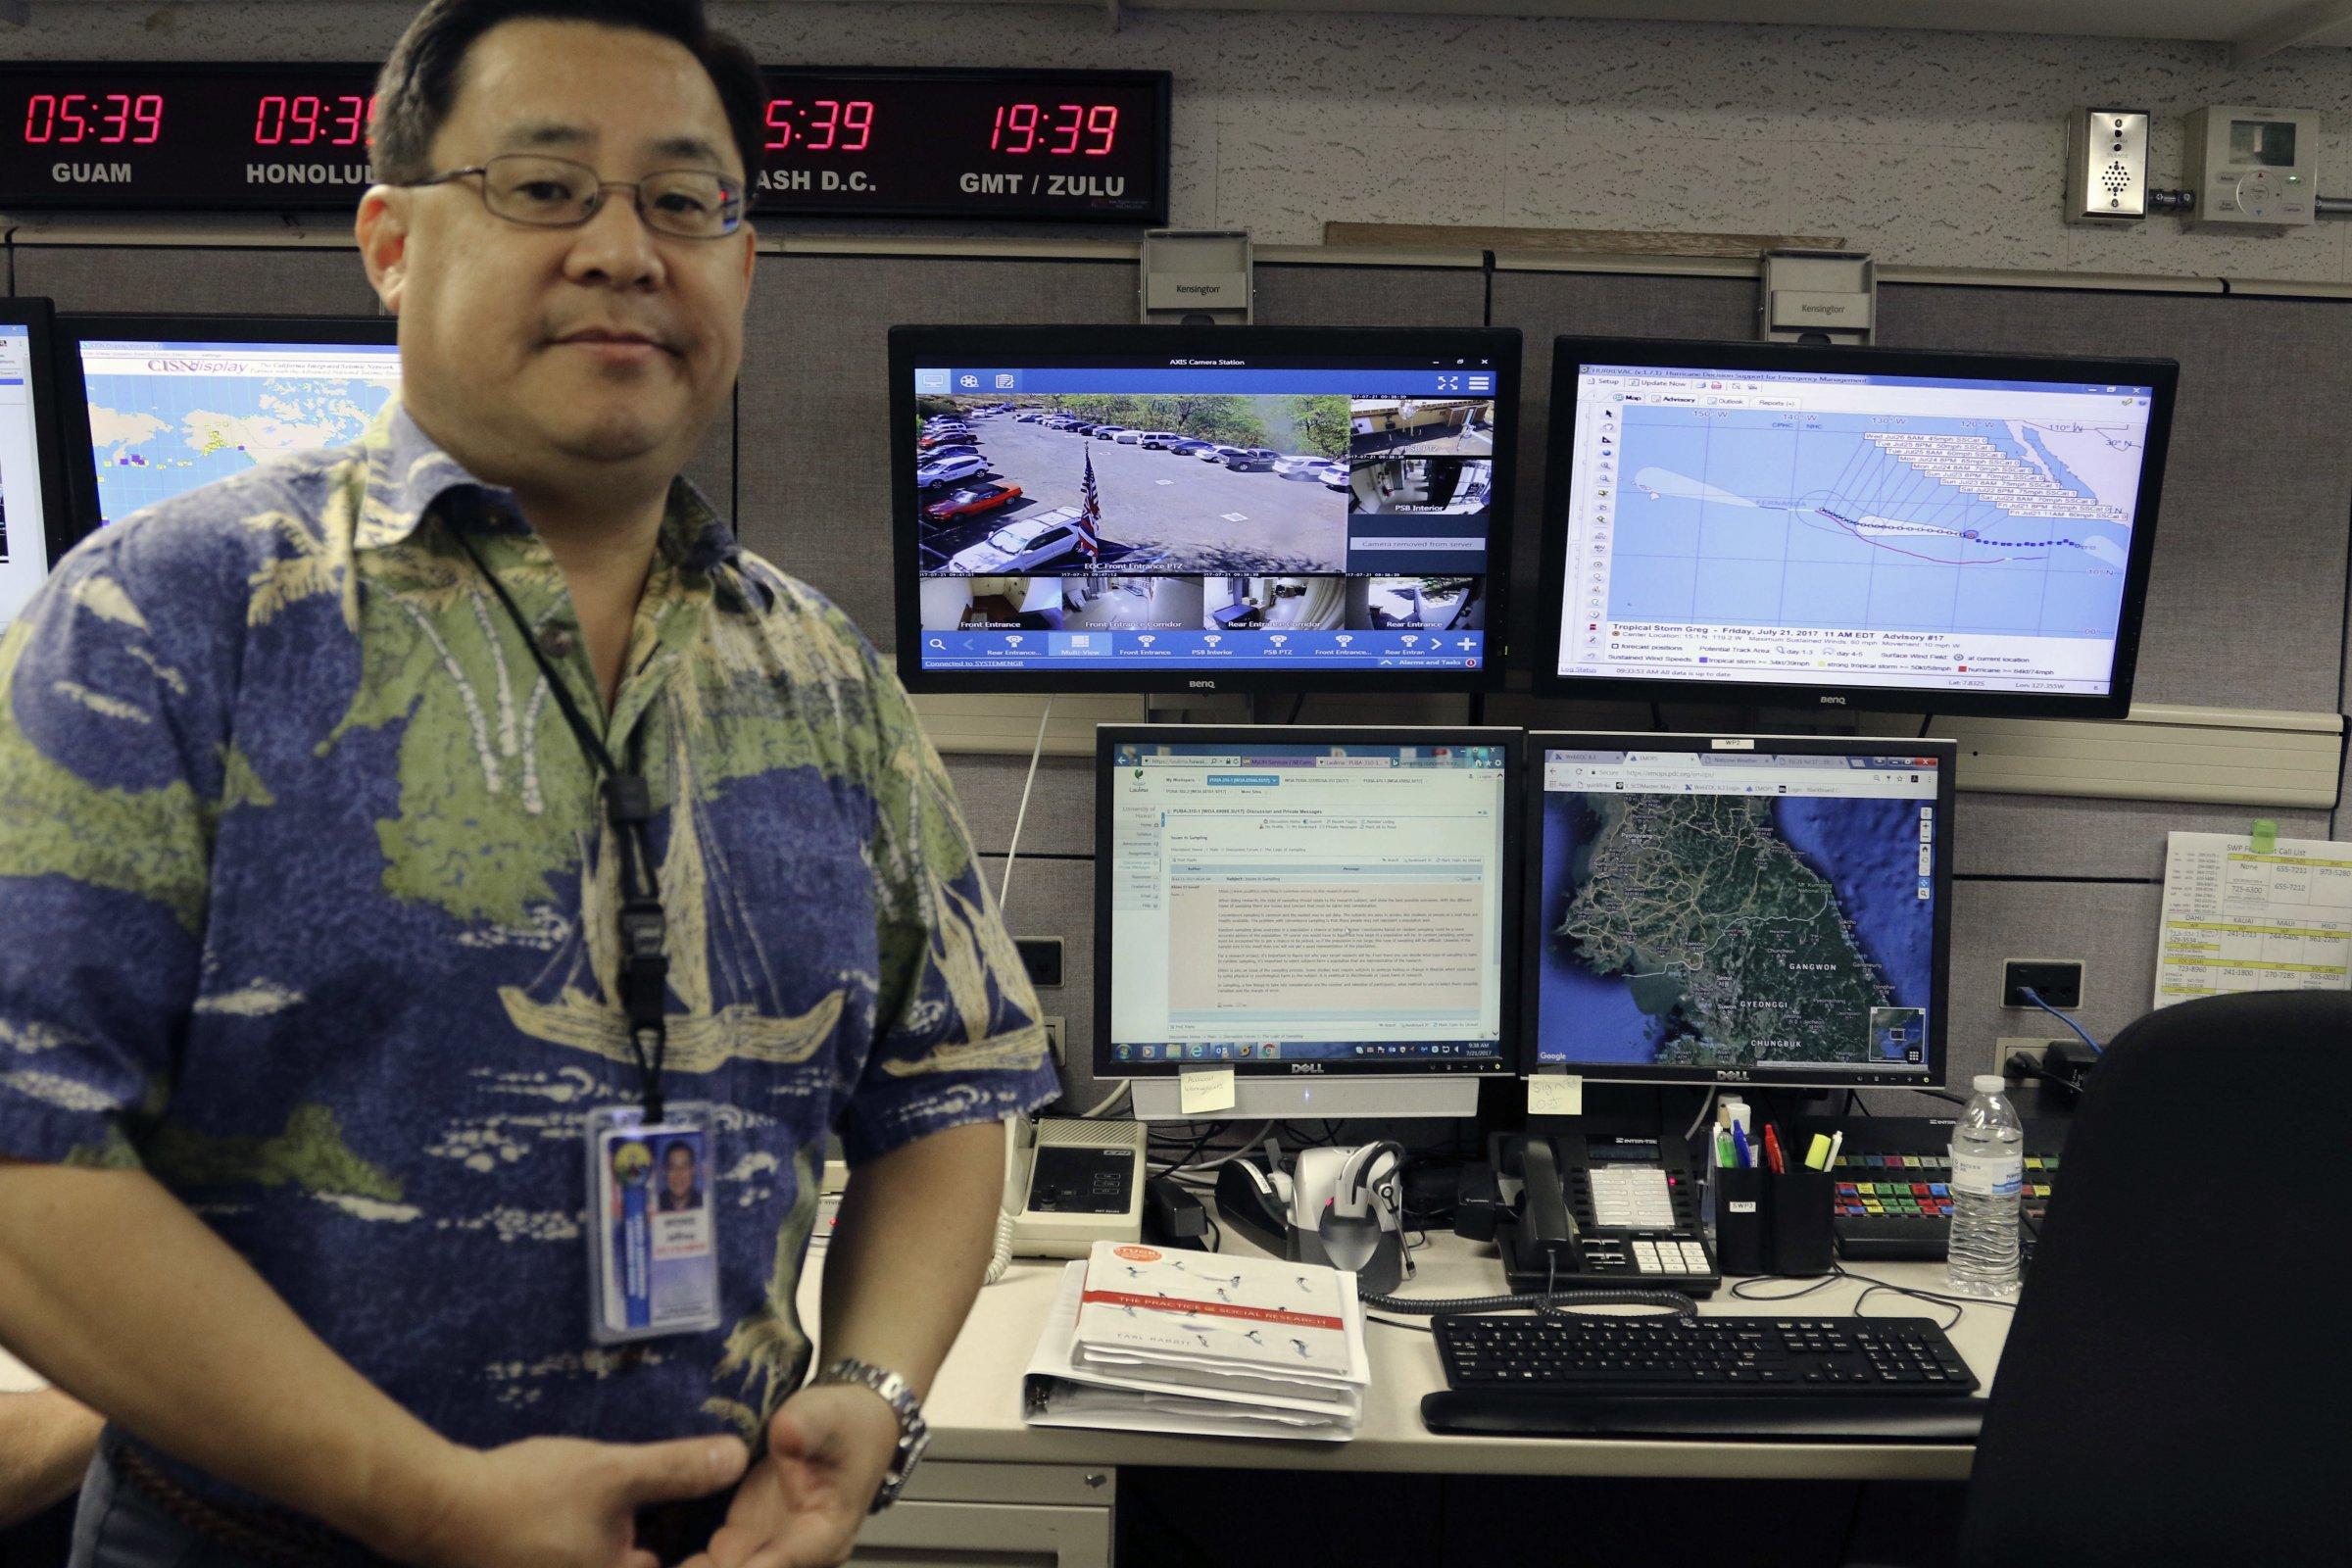 Short-Term Job Adventures Hawaii